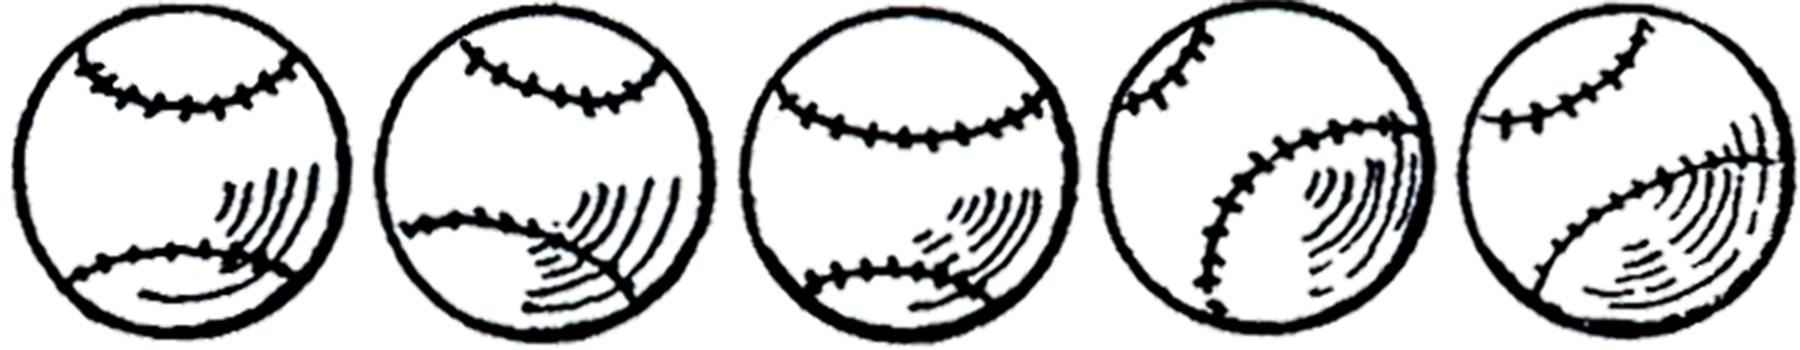 Baseball Border Clipart ...-Baseball Border Clipart ...-7